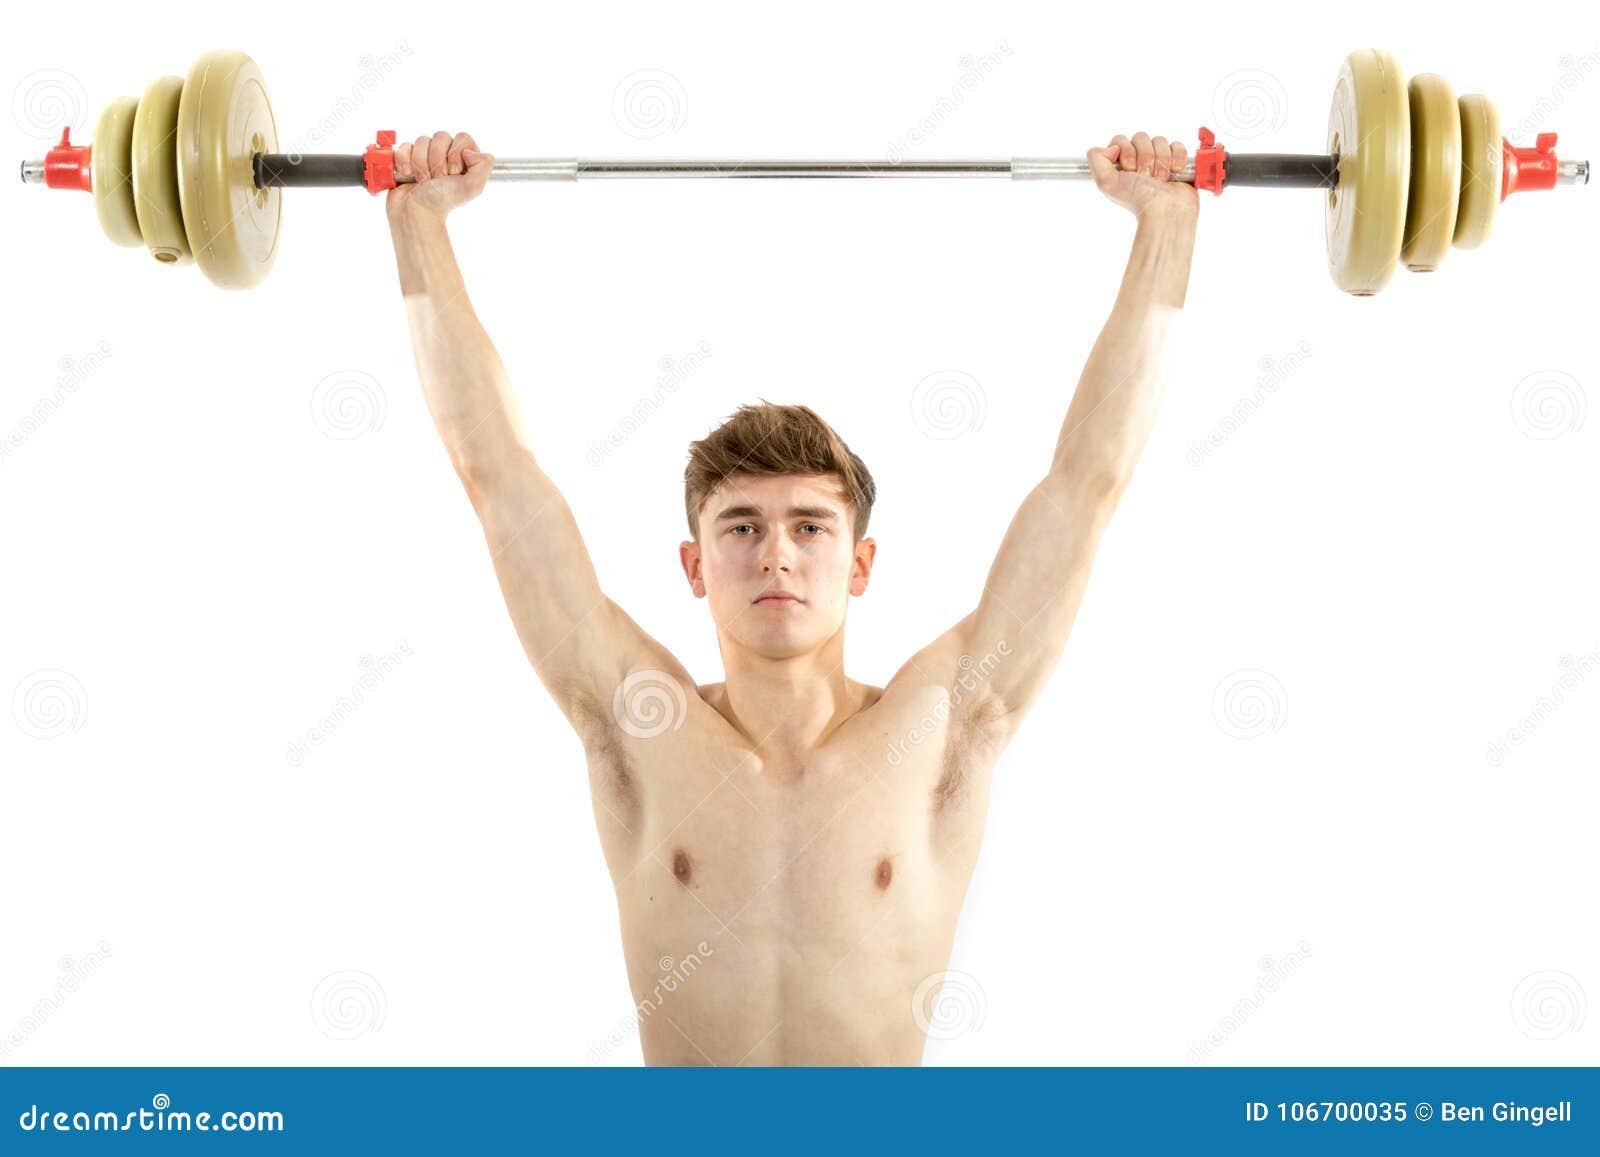 18 Year Old Teenage Boy Lifting Weights Stock Image - Image